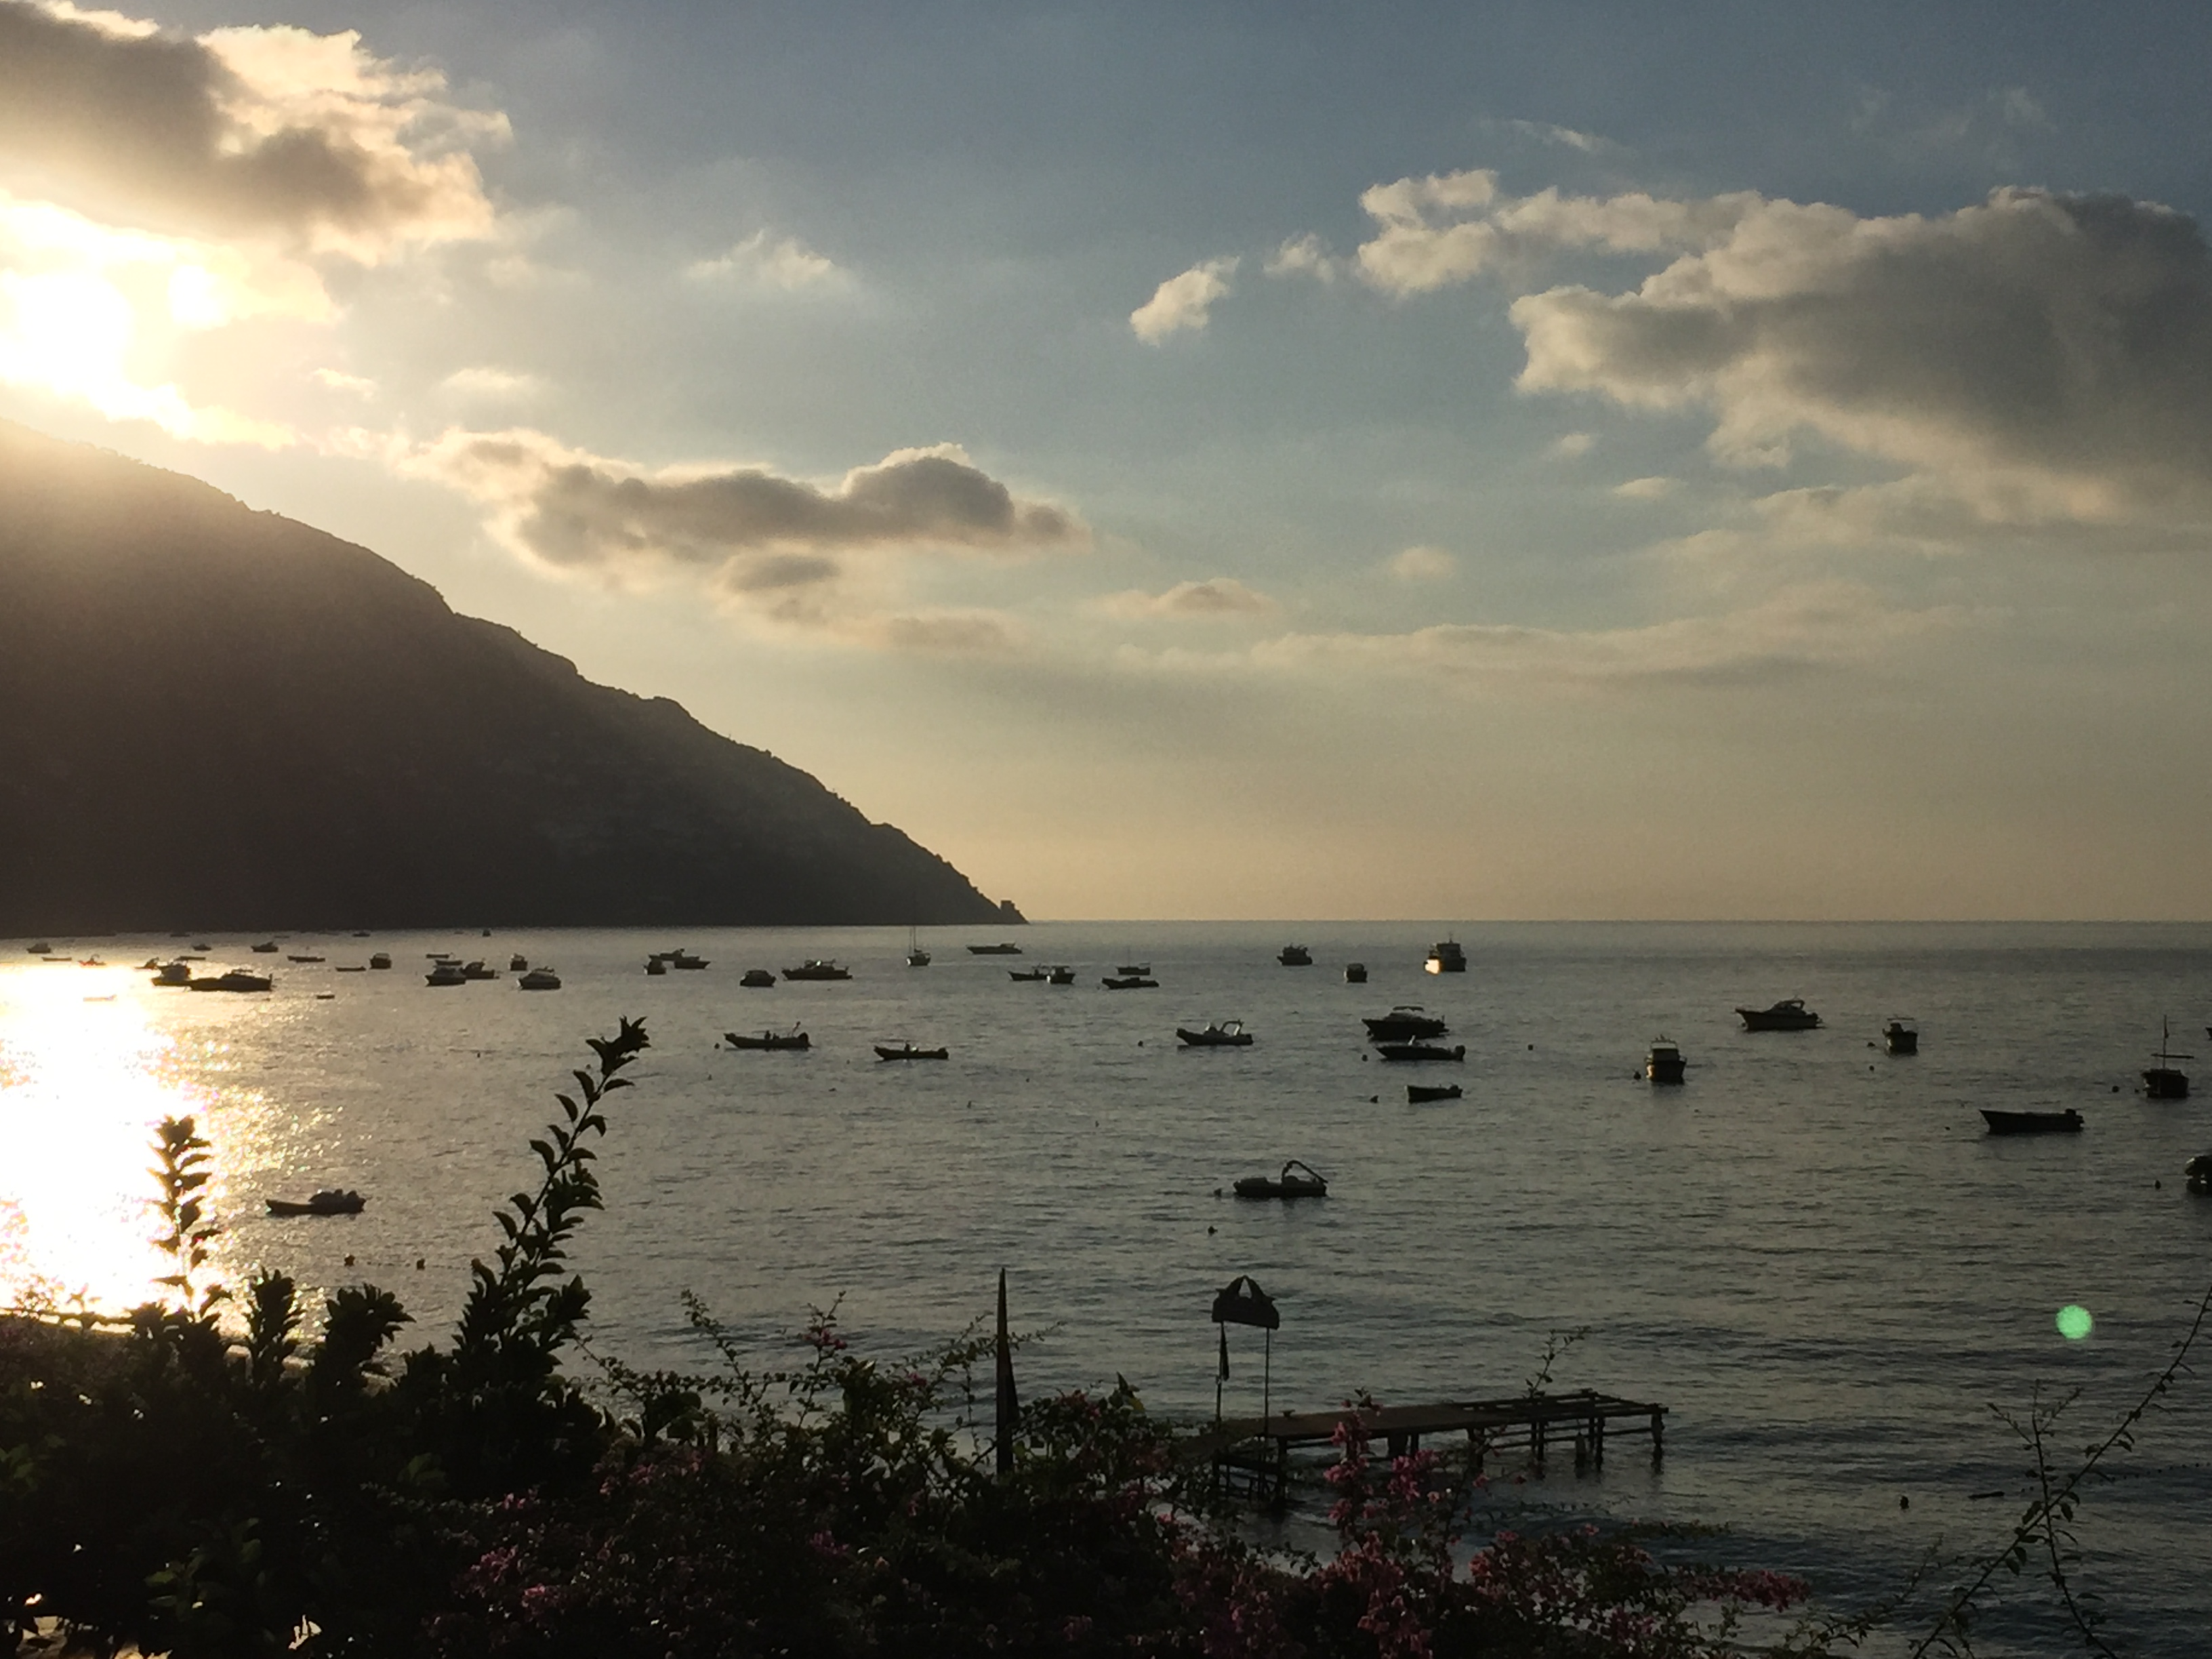 Travel in Italy – Photos from Positano